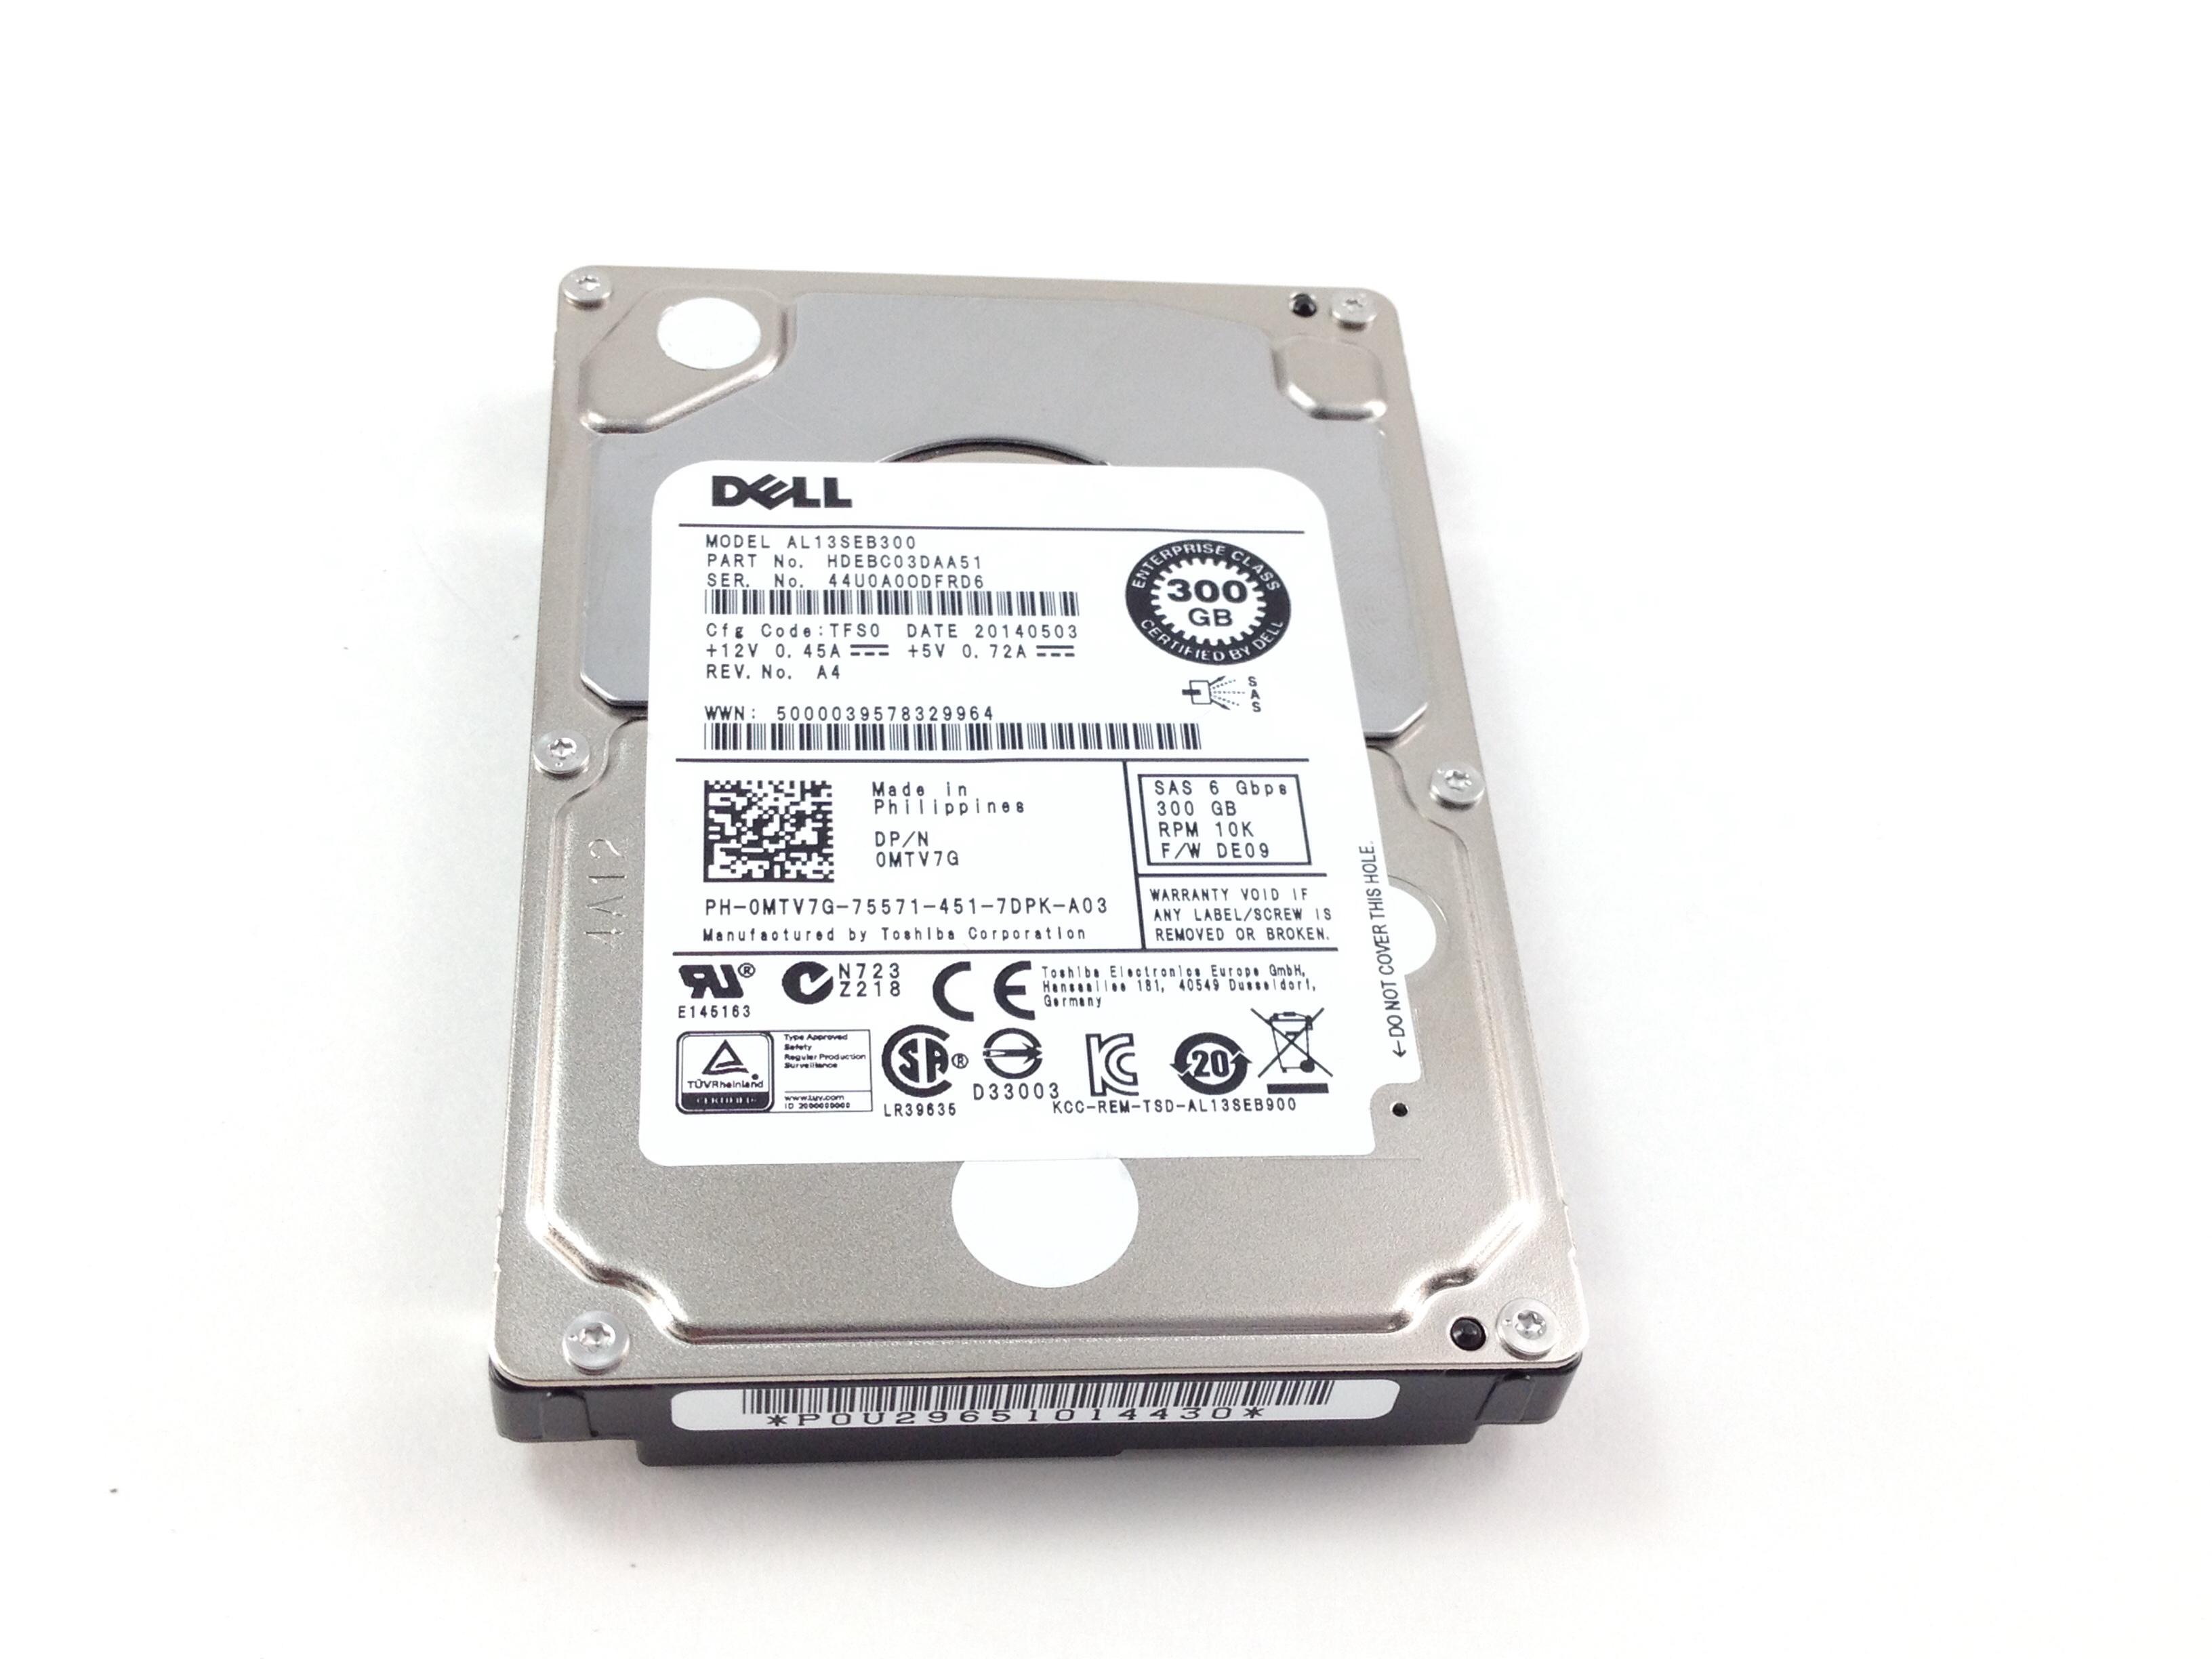 DELL 300GB 10K 6GBPS SAS 2.5'' HARD DRIVE (MTV7G)